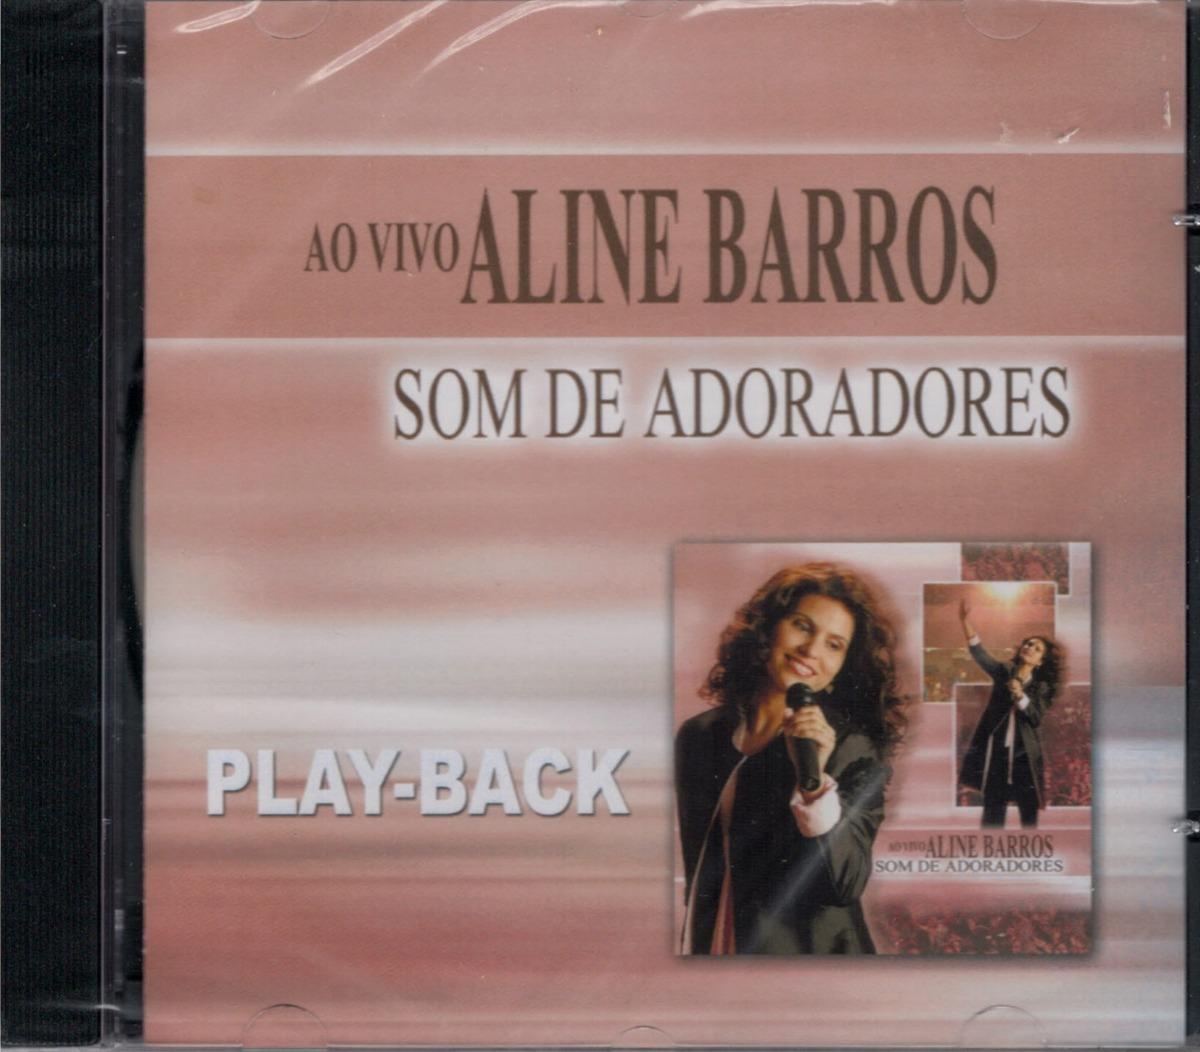 BAIXAR USA-ME PLAYBACK MUSICA SONDA-ME